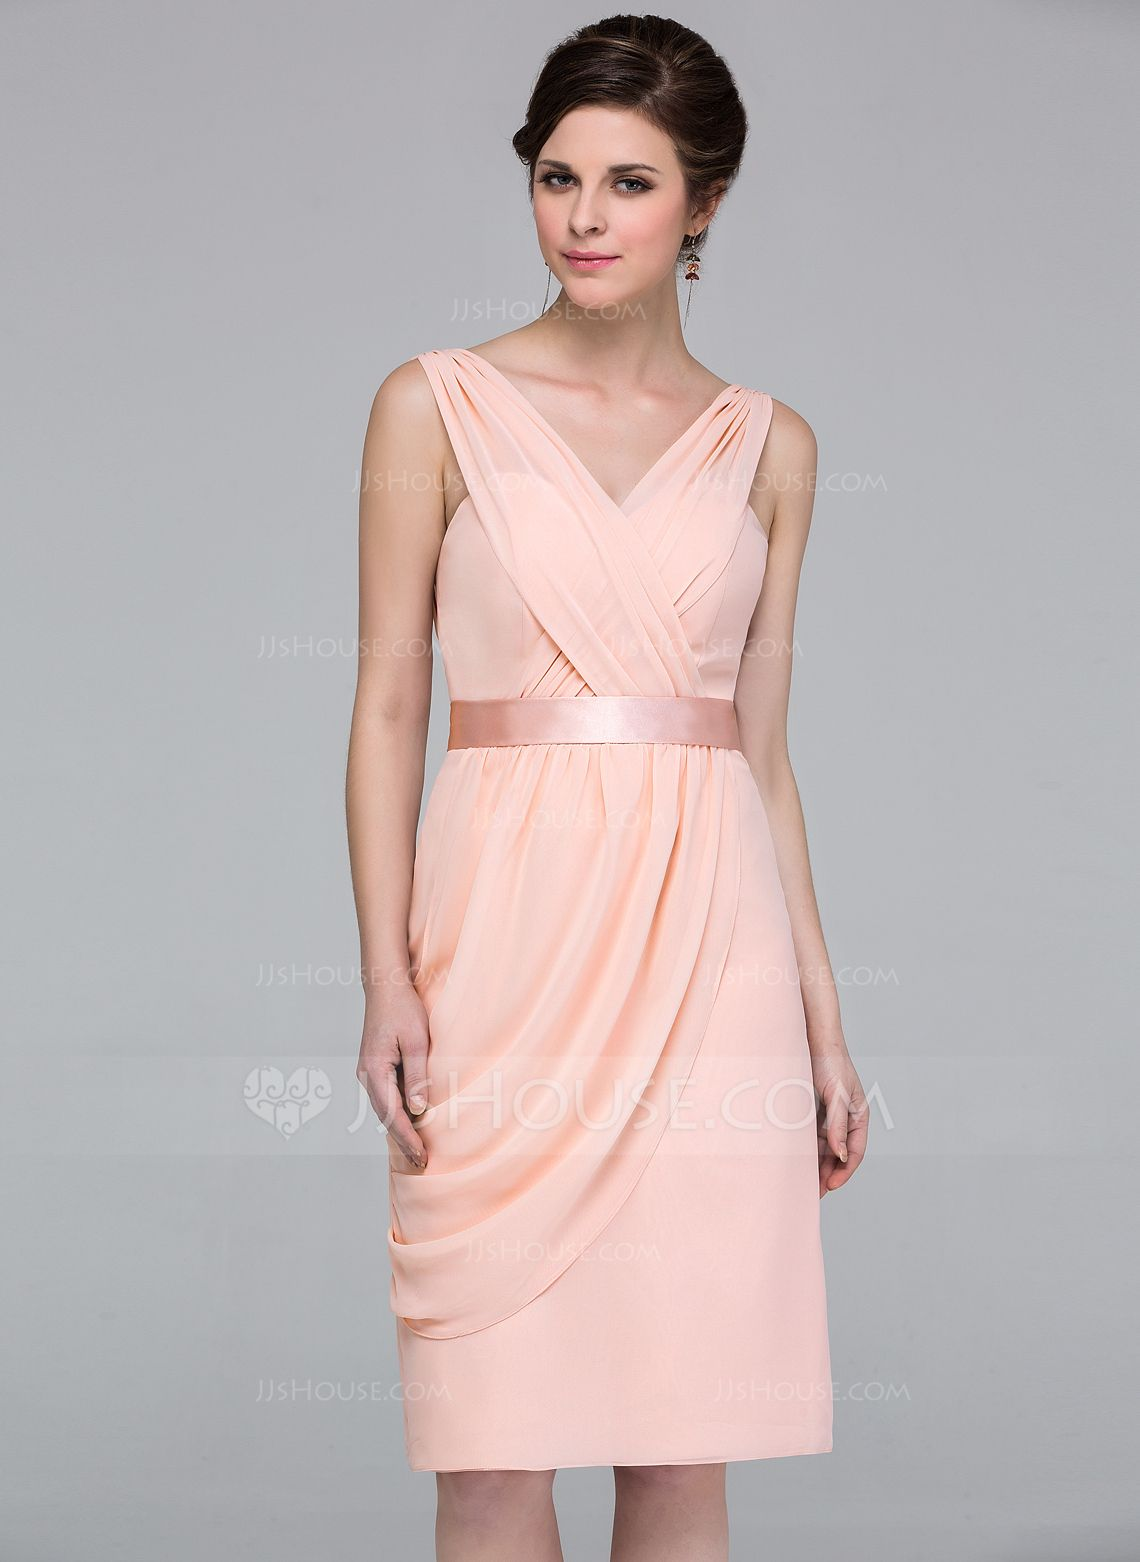 Peach dress for wedding guest  Column Kneelength Chiffon Bridesmaid Dress with Side Draping